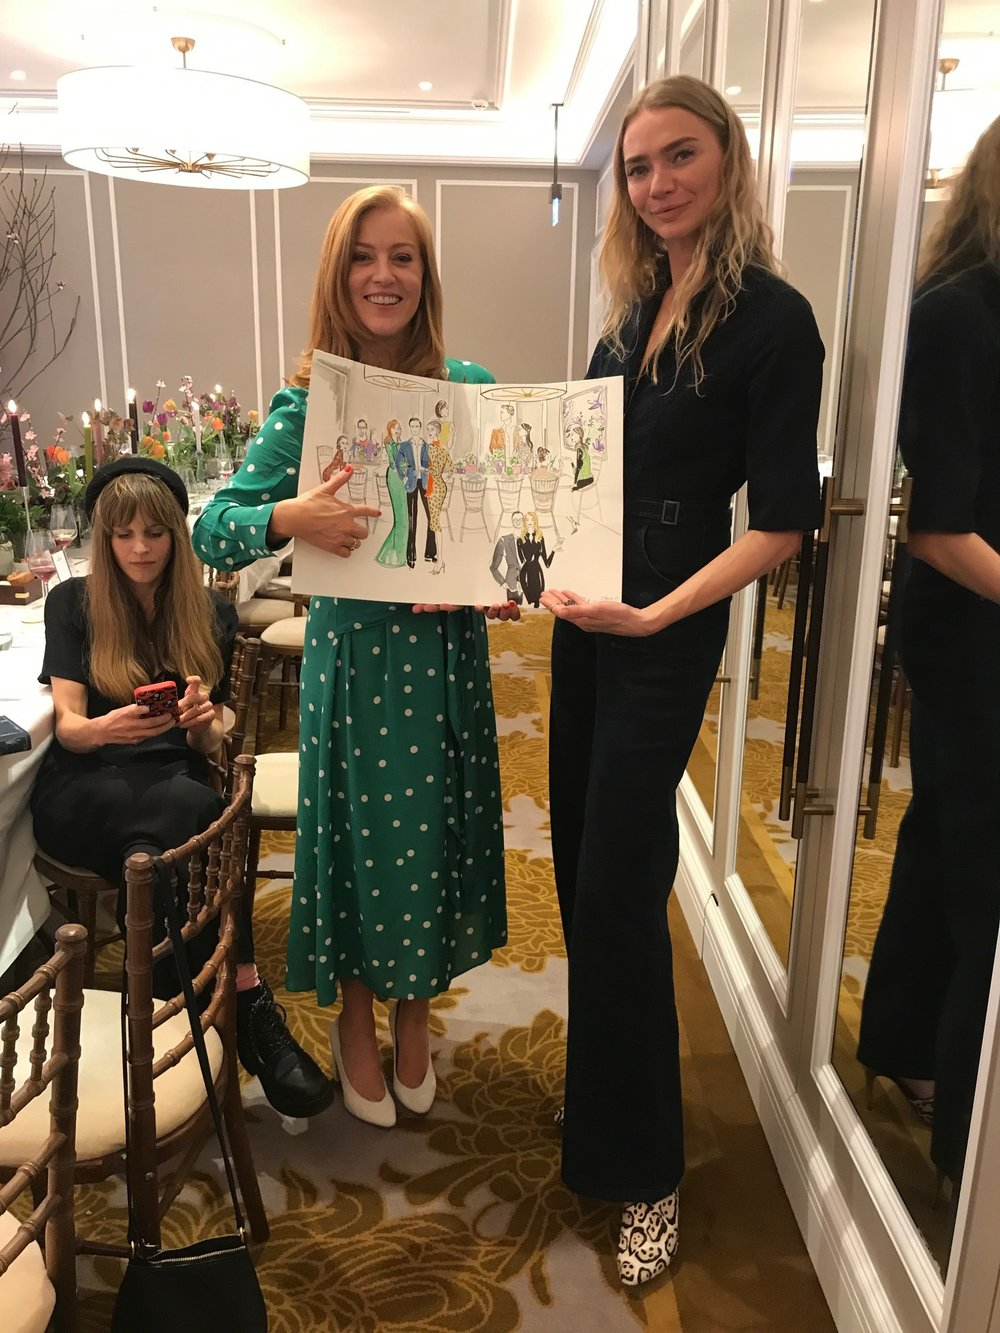 Sarah-Jane Mee and Jodie Kidd Fashion Illustration